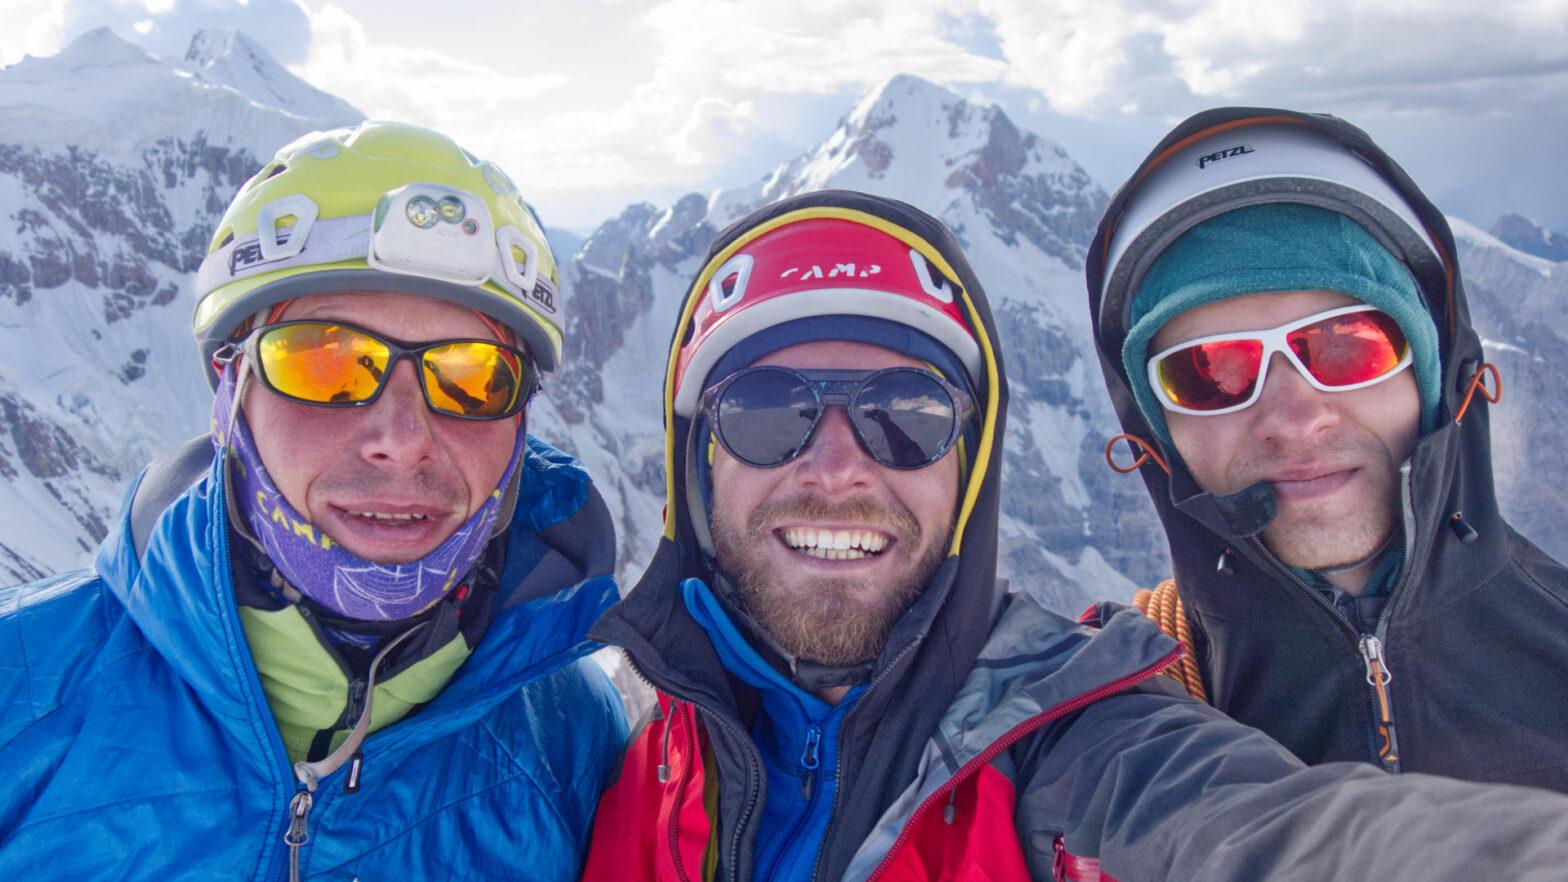 Иван Темерев, Кирилл Белоцерковский, Алексей Тюлюпо на вершине Альпиниста, 5482 м